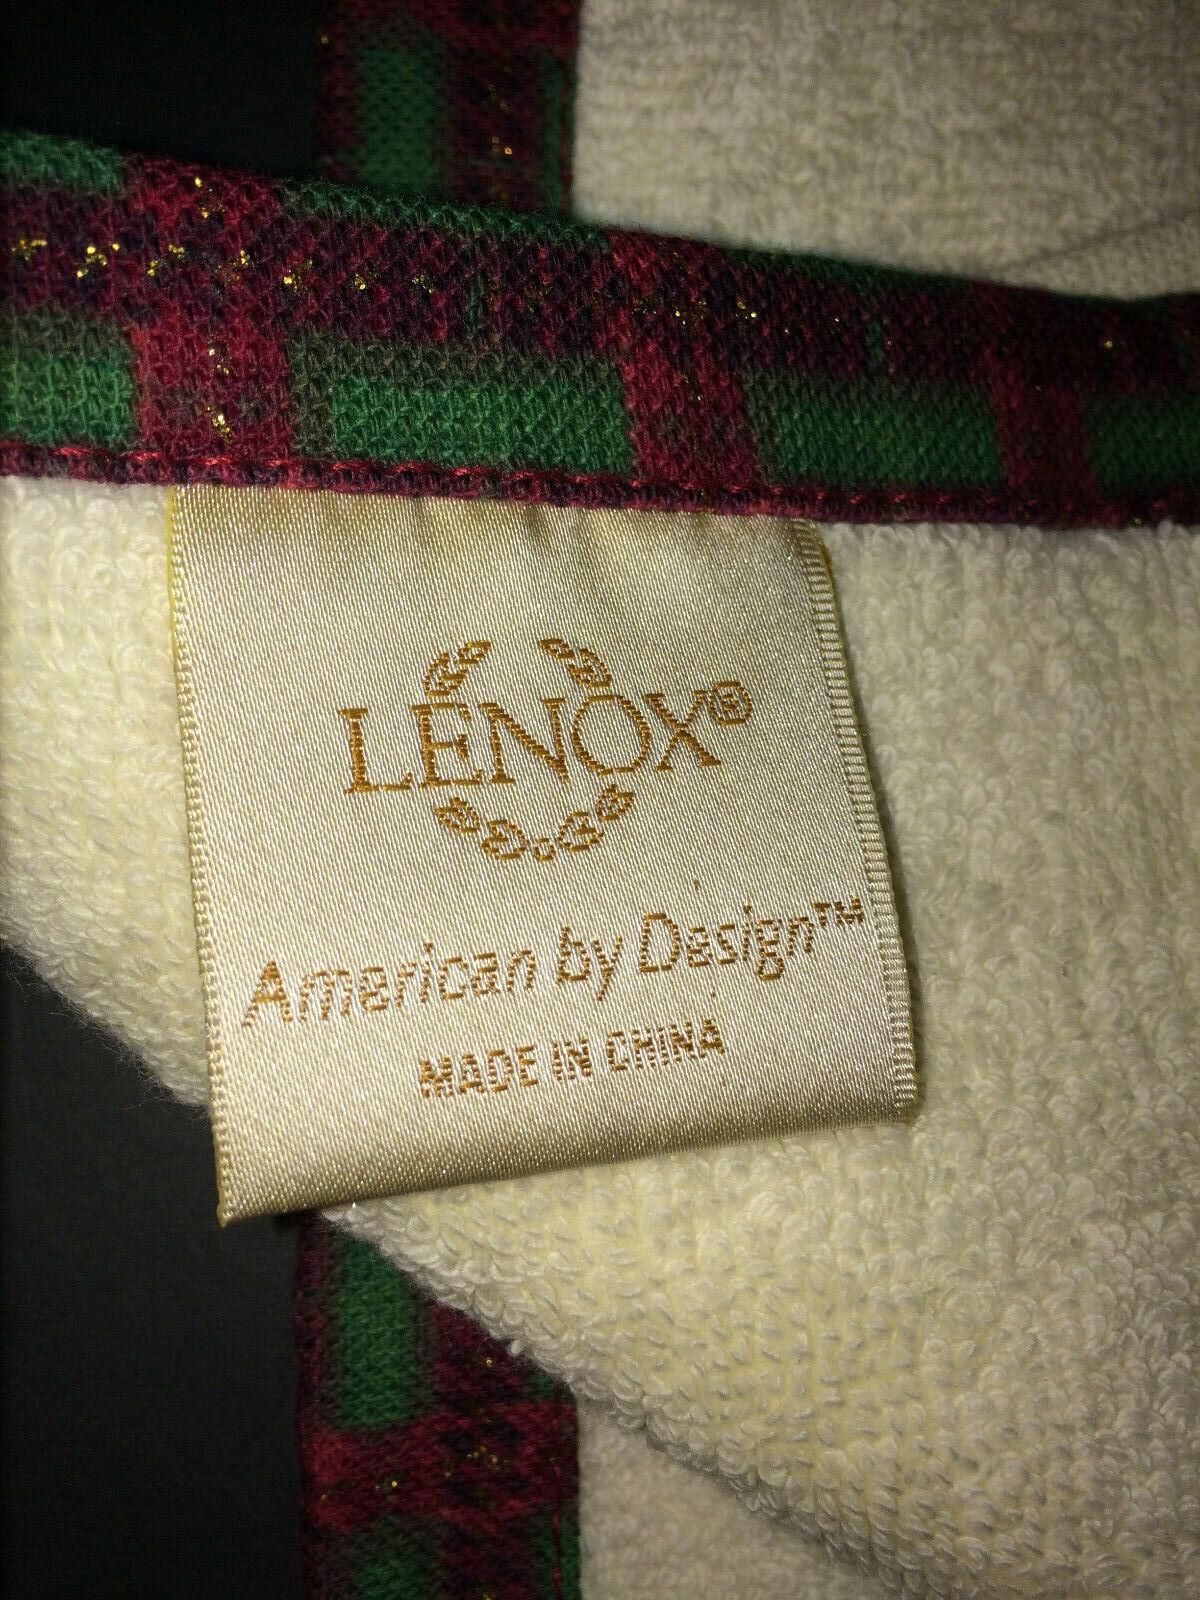 2pk Lenox Holly Bath Fingertip Towel Red Trim Cotton 11x18 in Gift Box NIB $30